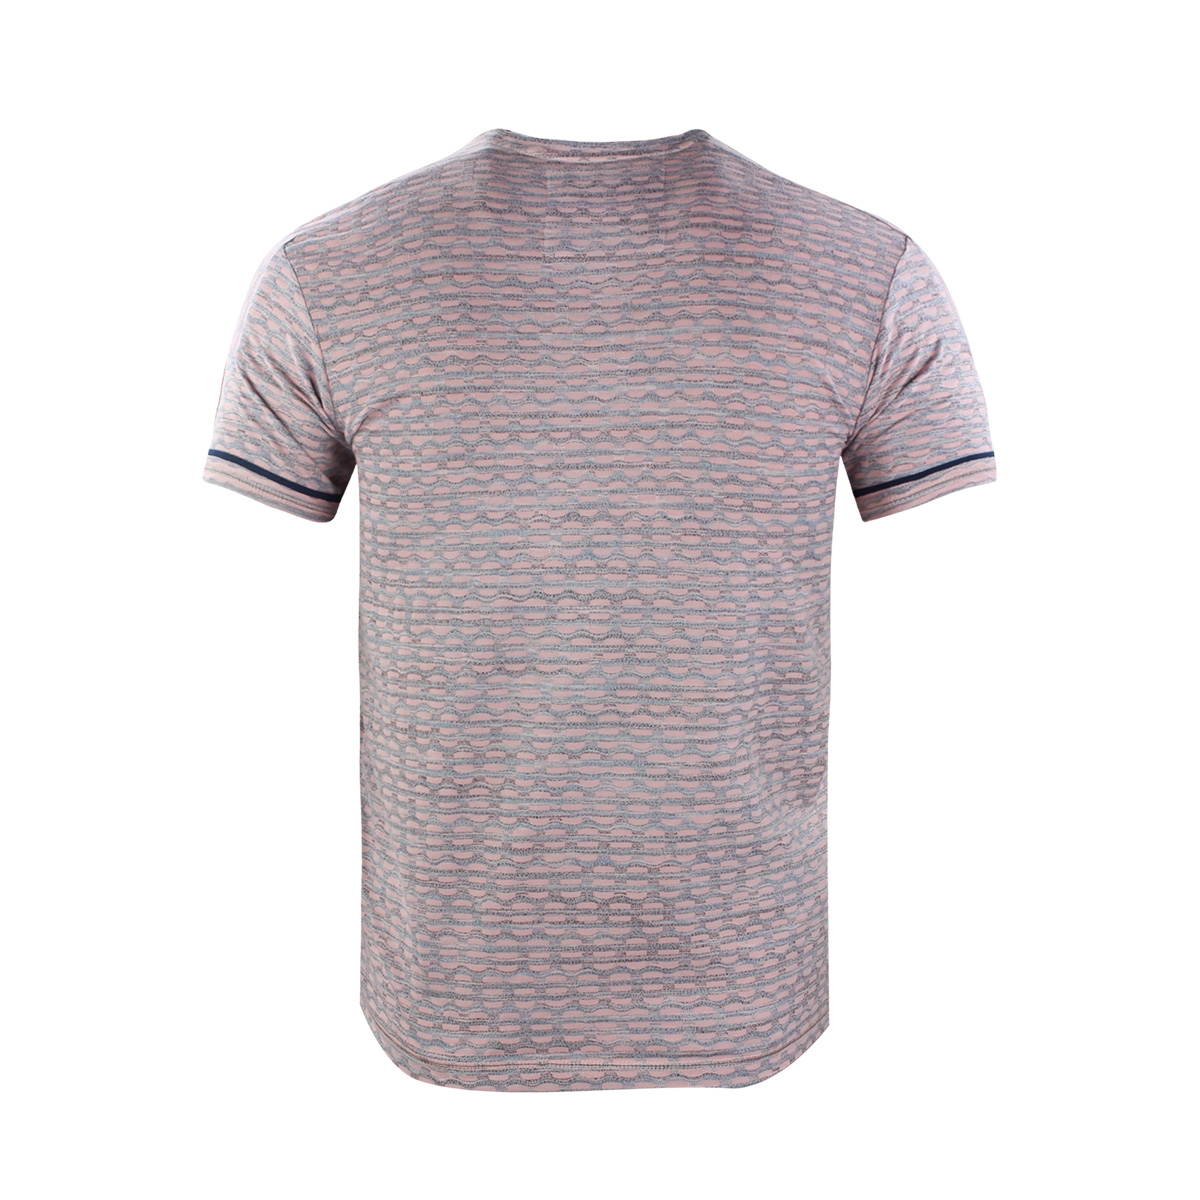 t shirt 15184 gabbiano t-shirt pink